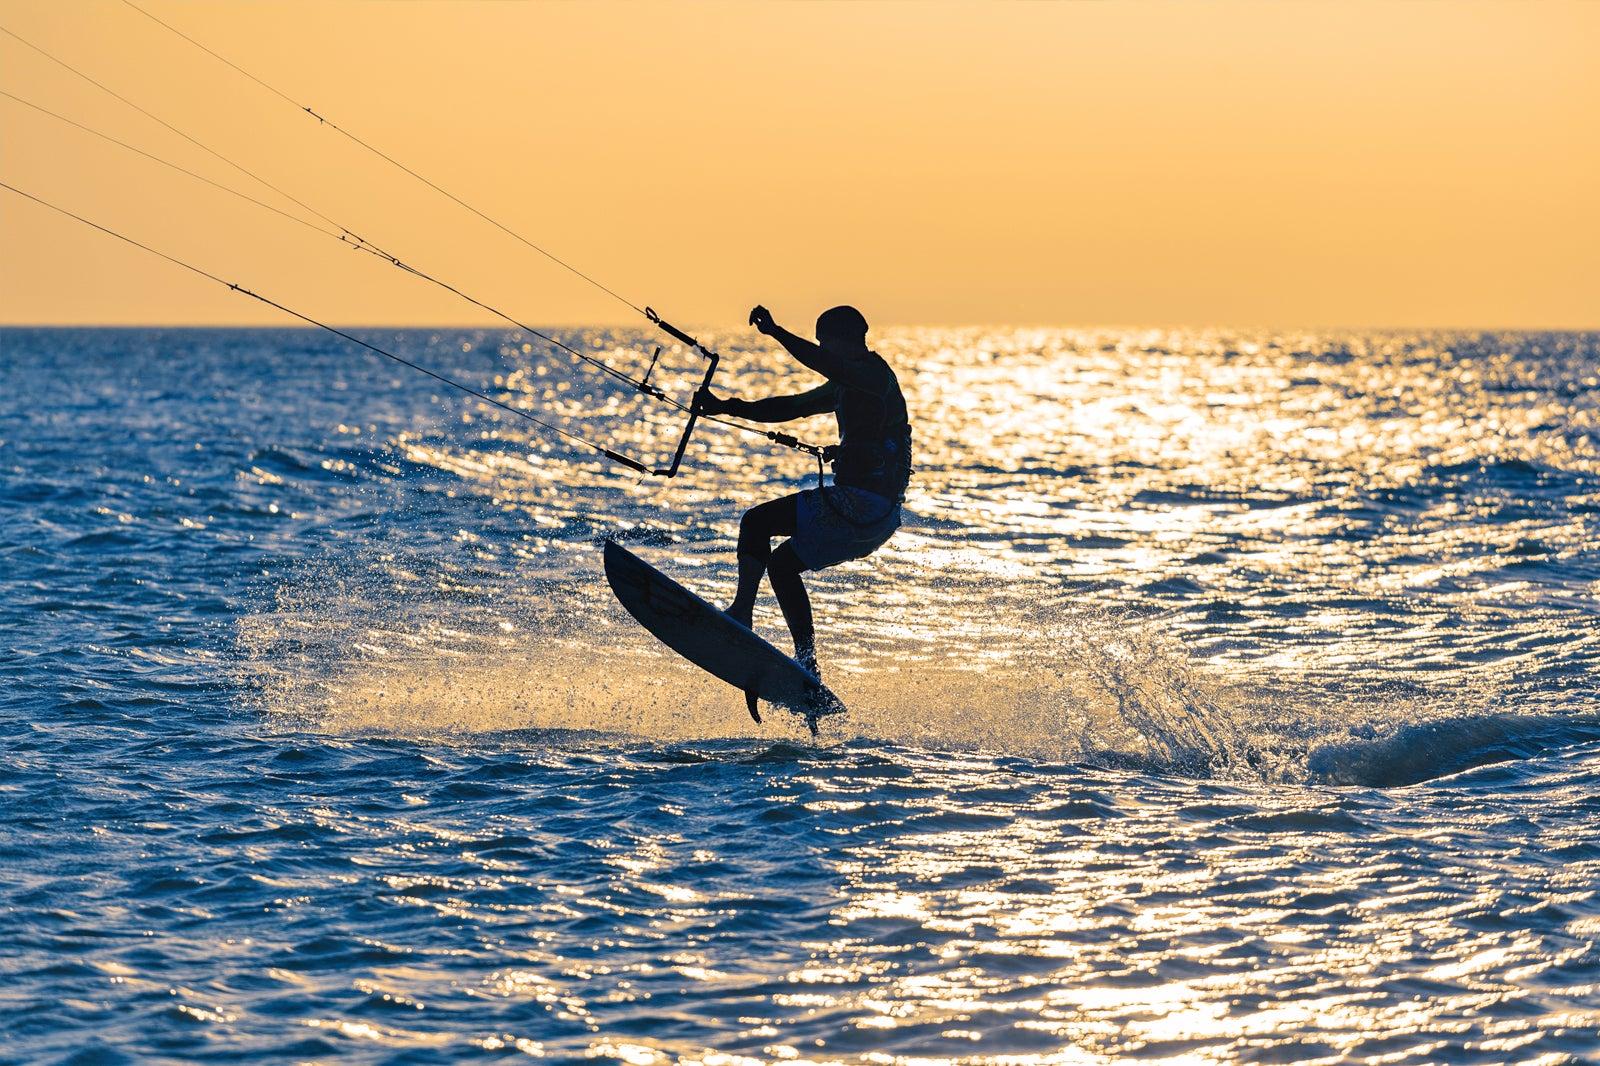 Kitesurfing In Bali A Mini Guide To